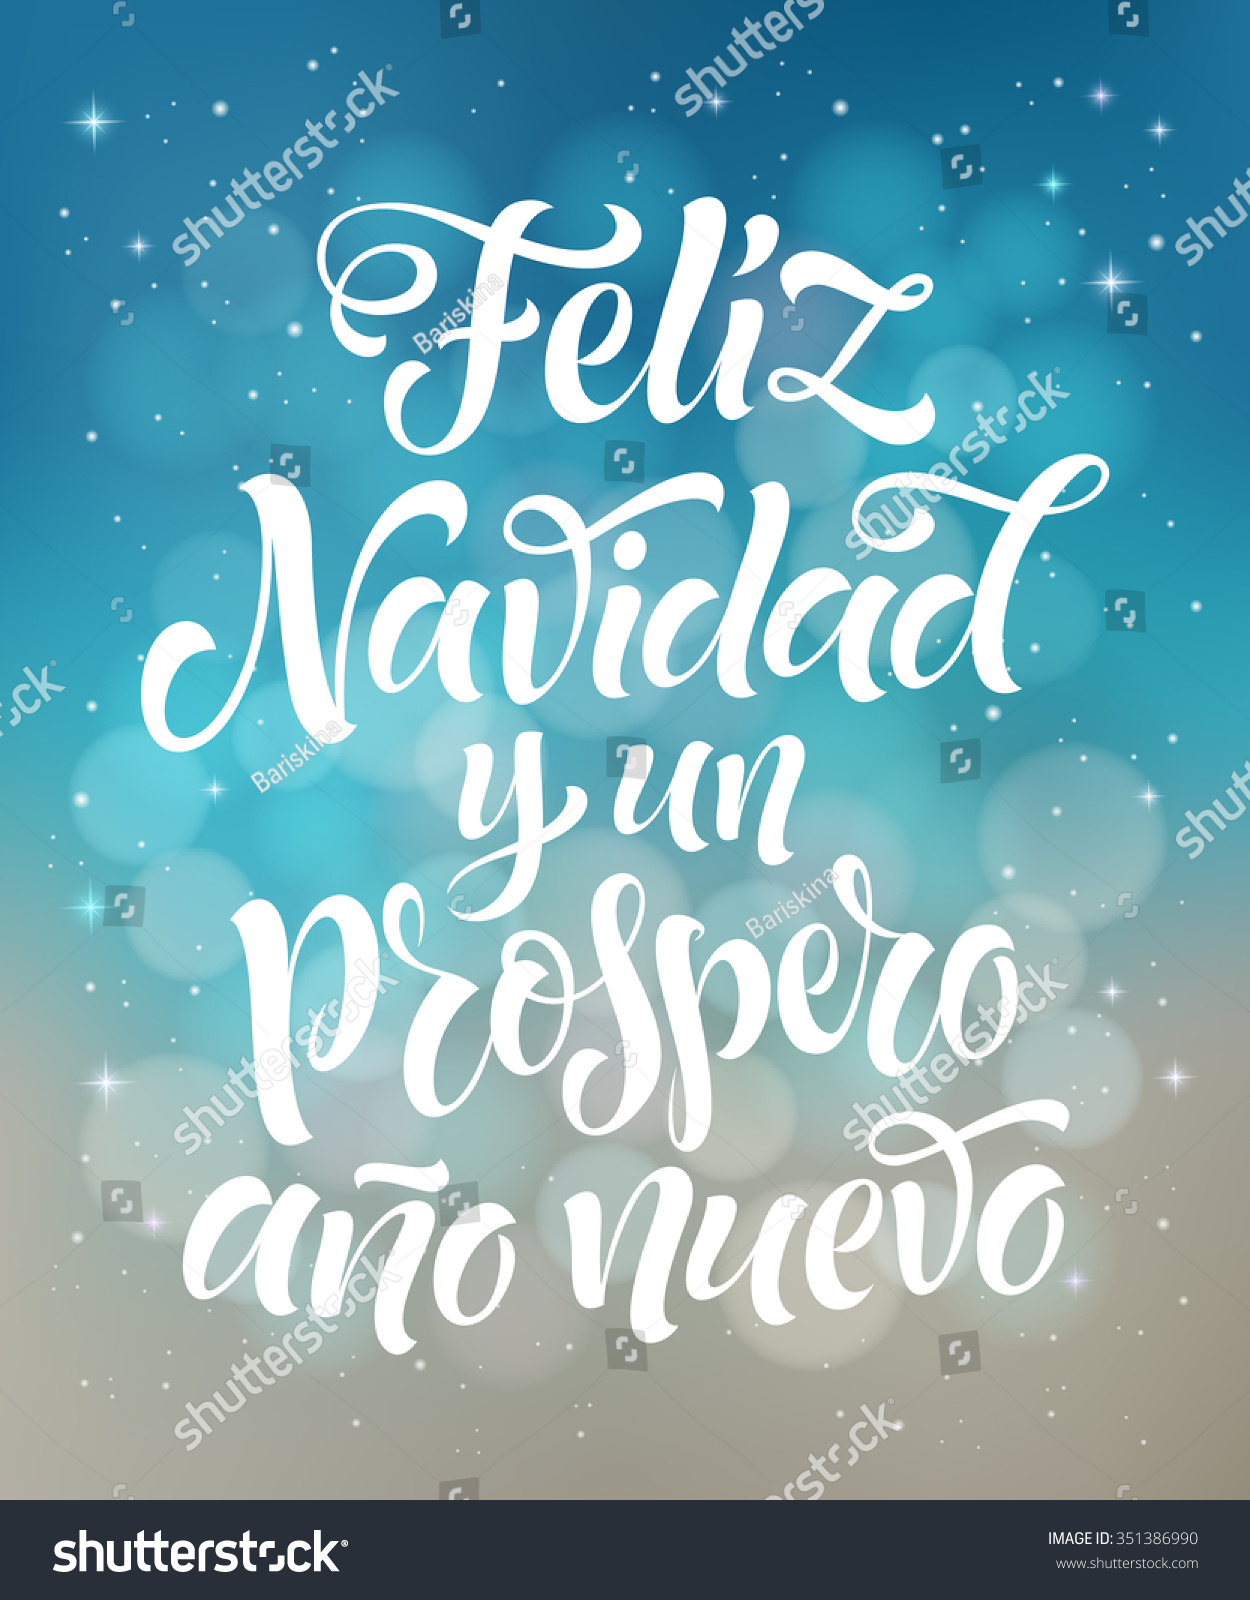 Merry christmas happy new year text stock vector 351386990 merry christmas and happy new year text in spanish feliz navidad y un prospero ano m4hsunfo Choice Image